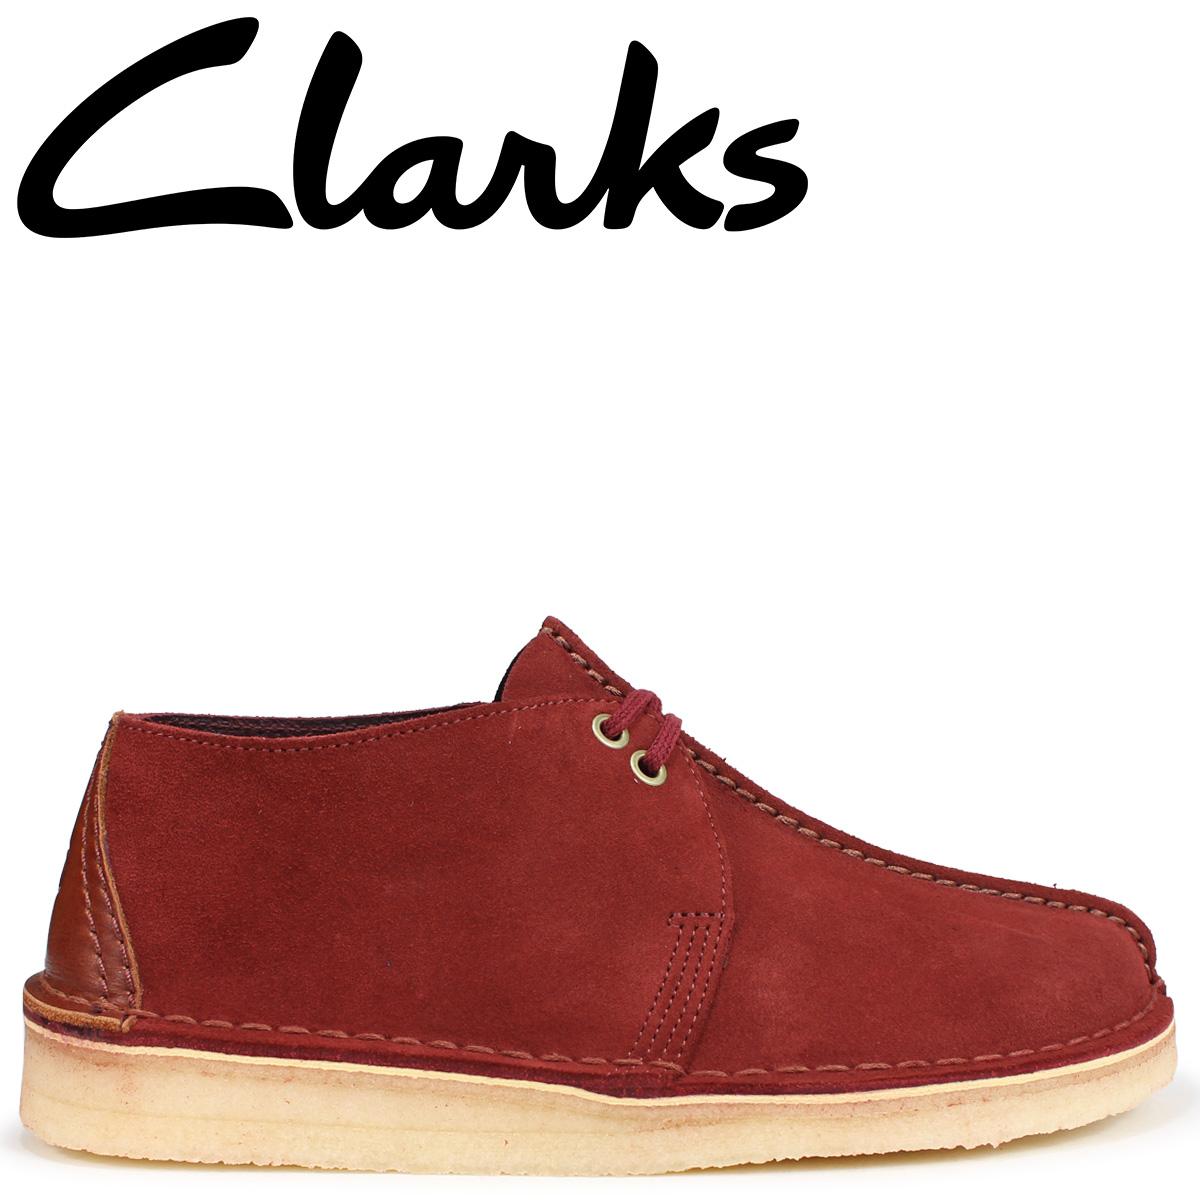 Clarks デザート ブーツ メンズ クラークス DESERT TREK 26134763 ブラウン